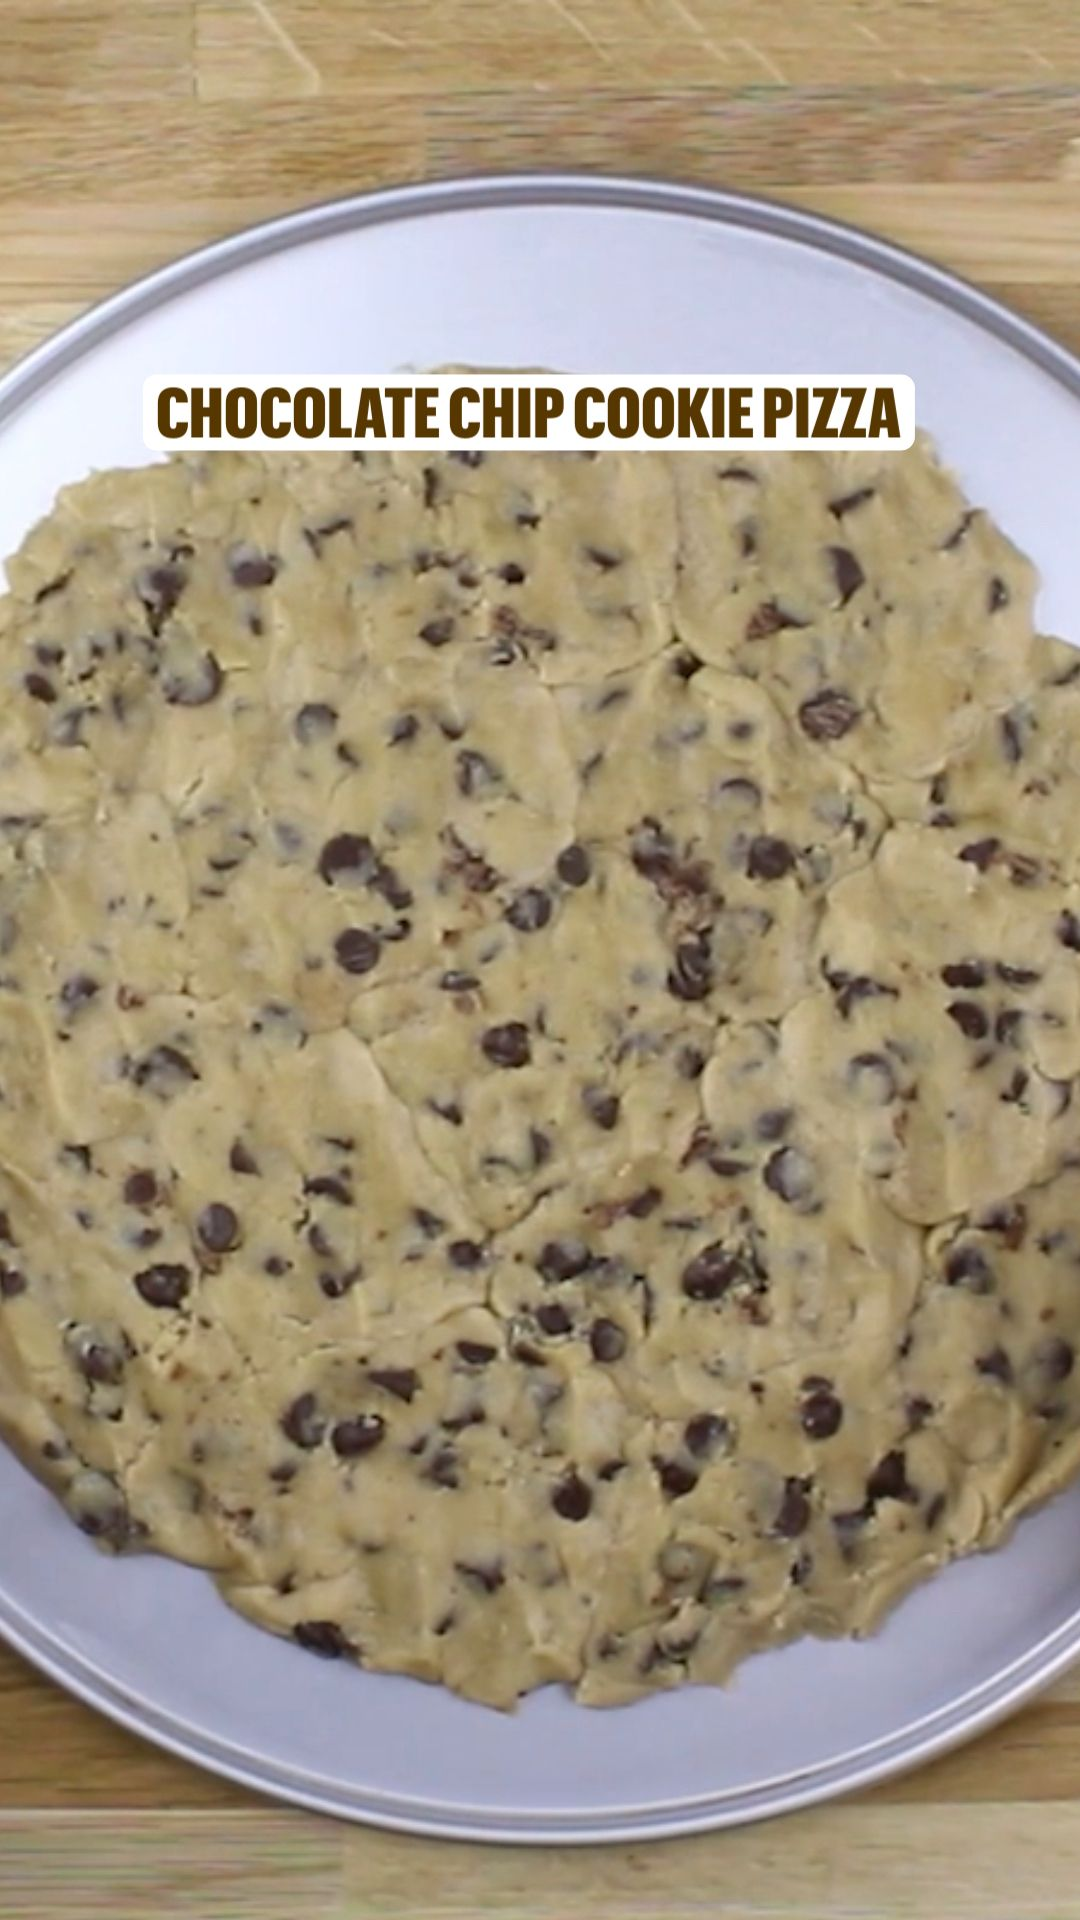 Cookie Pizza - Food Dolls